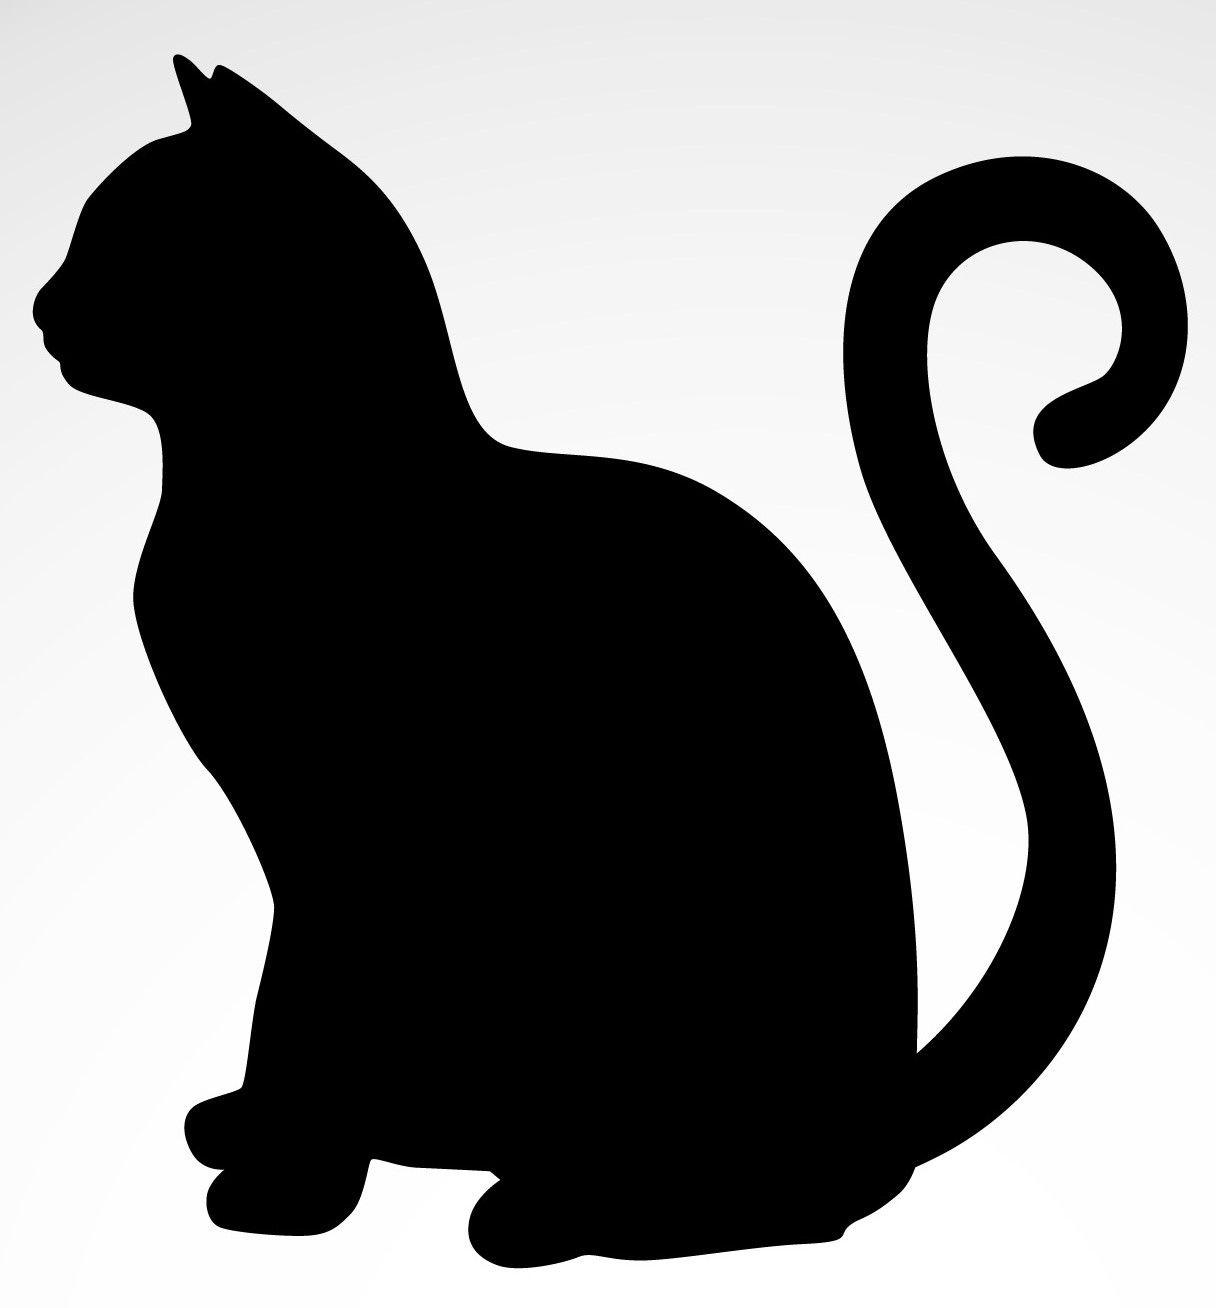 Back Cat Silhouette | Glass Ornament Silhouette | Cat Silhouette - Free Printable Cat Silhouette